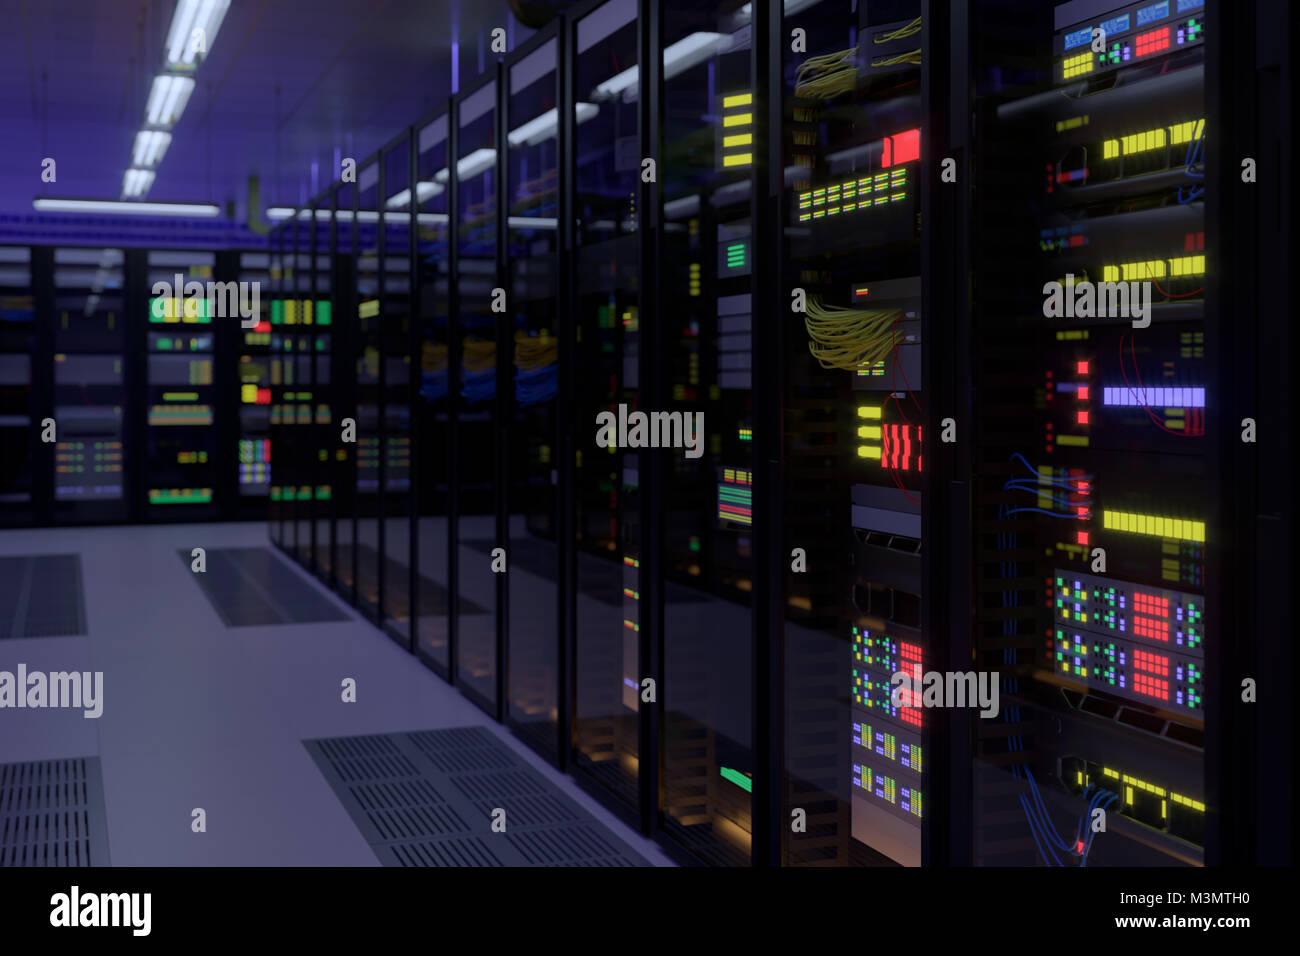 Supercomputer Stock Photos & Supercomputer Stock Images - Alamy